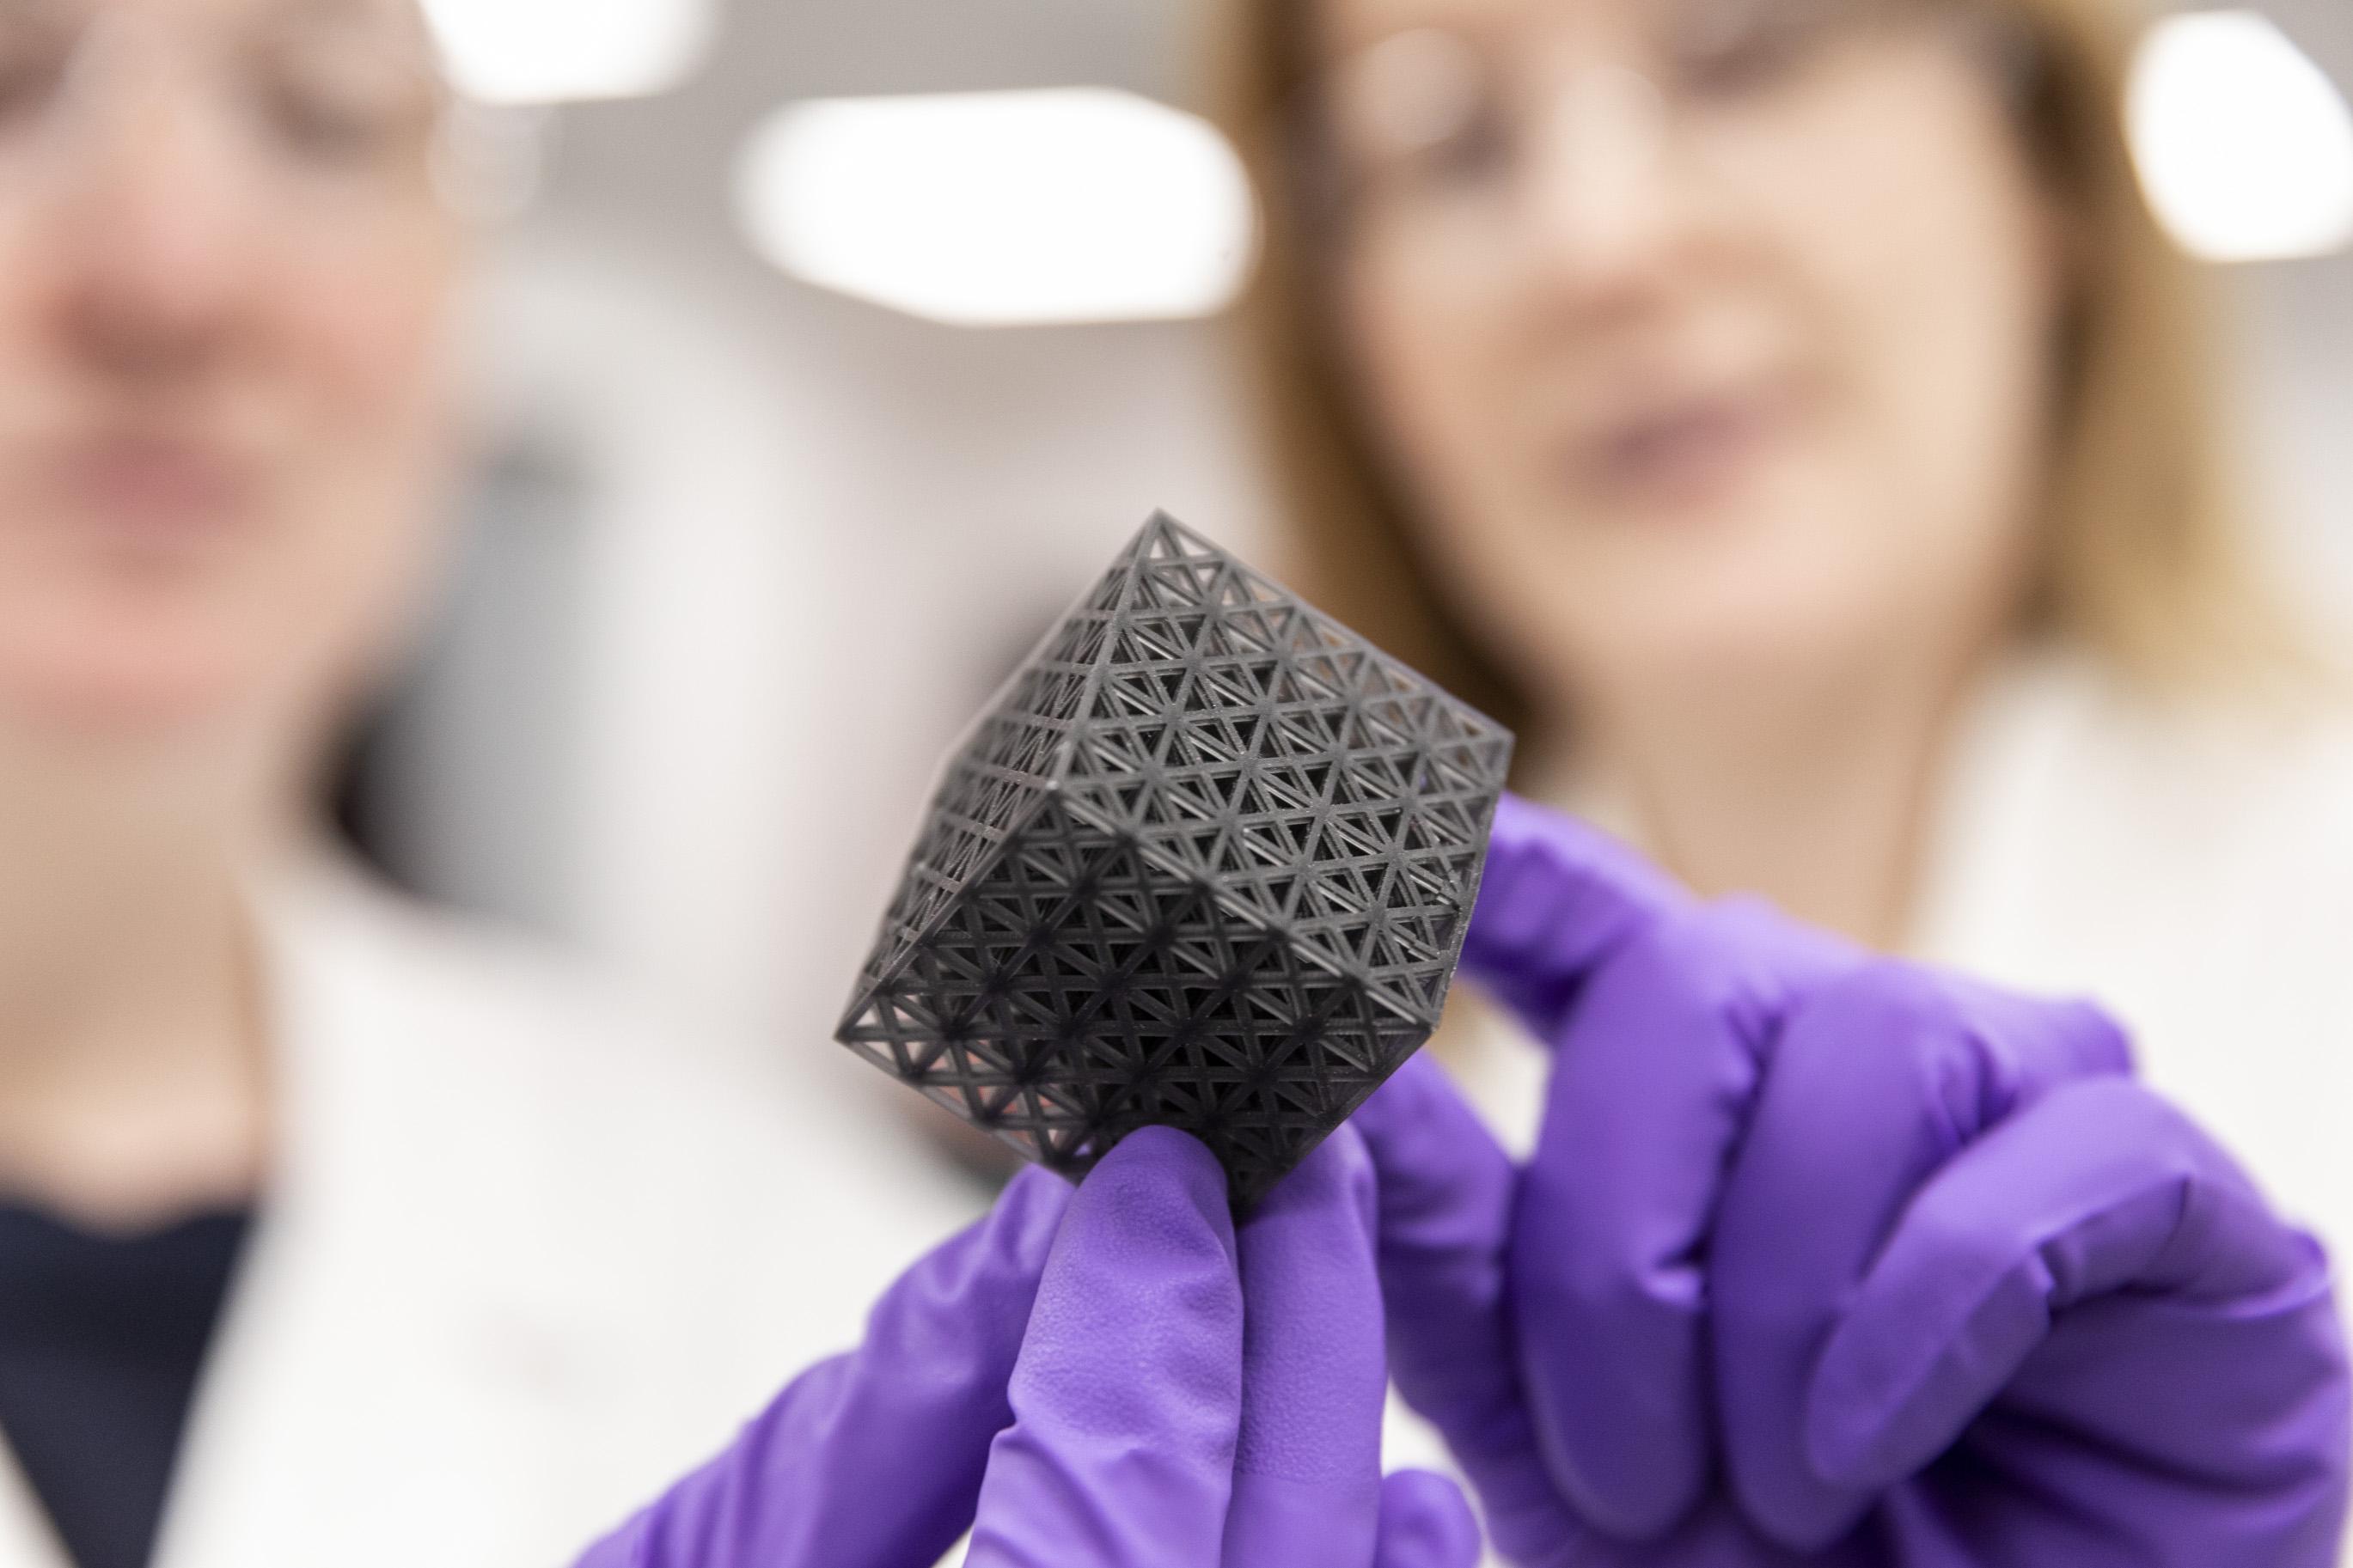 3D printed sample of Locitite resin. Photo via Henkel